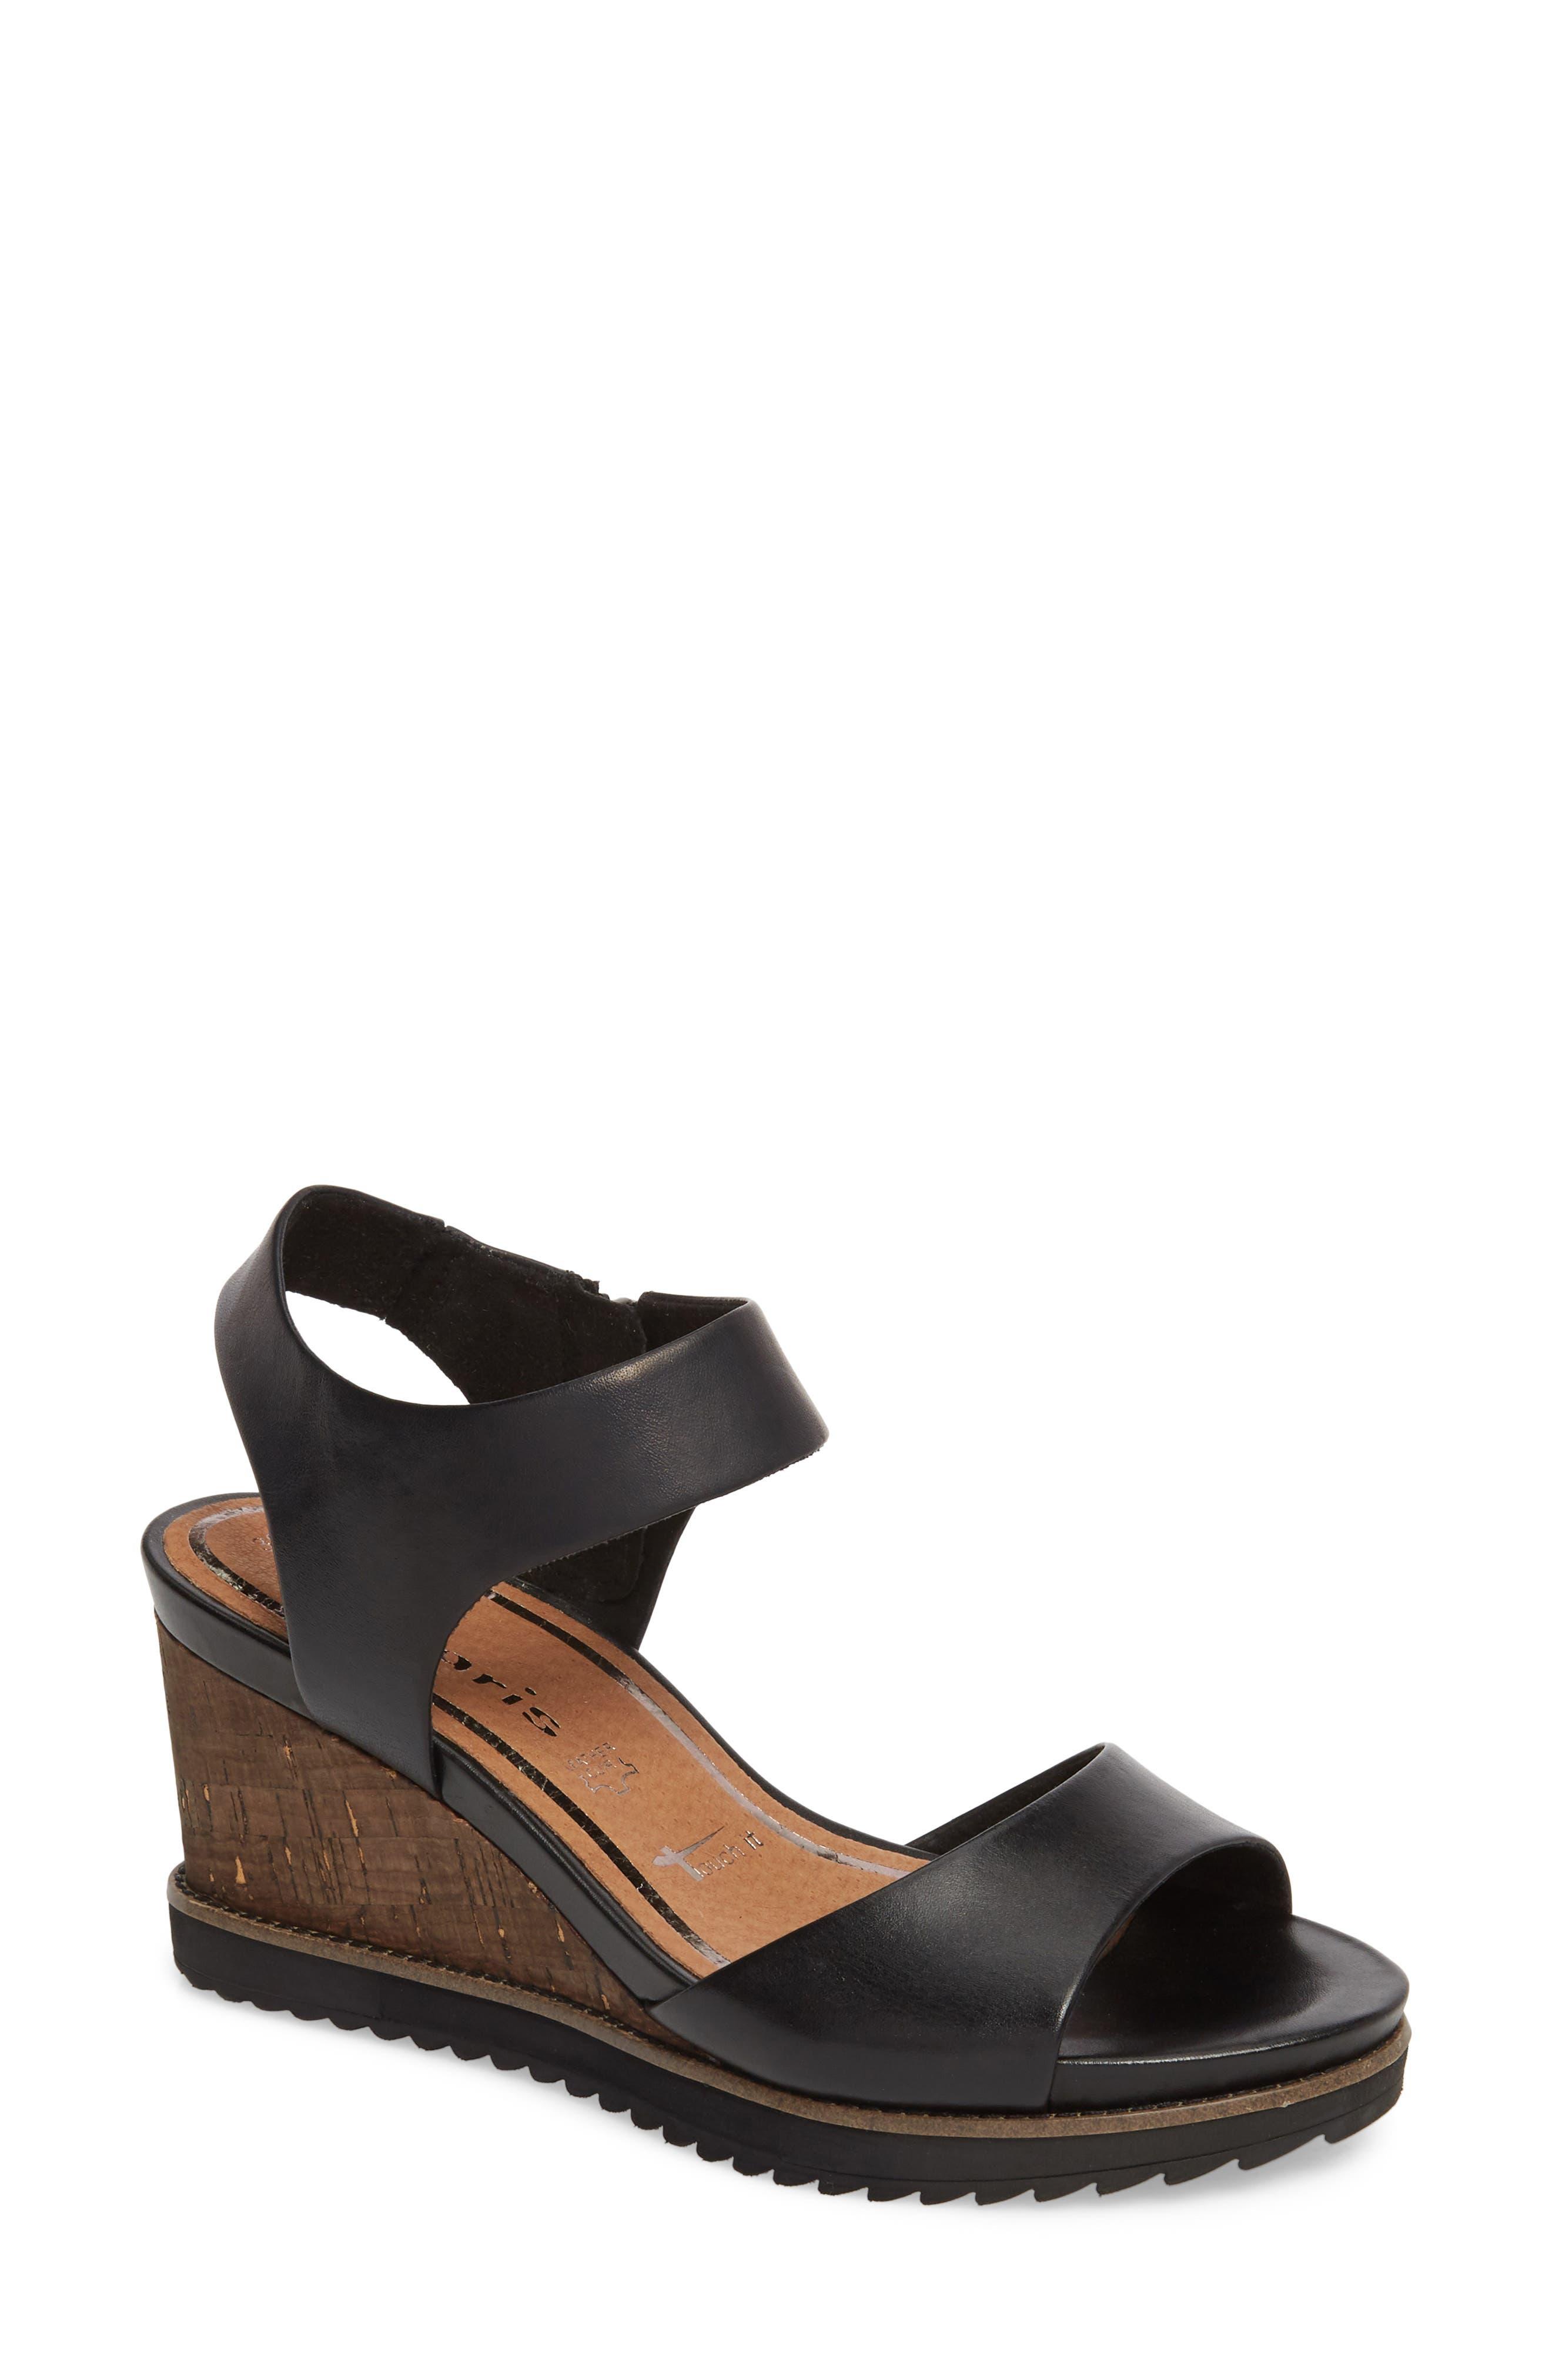 'Alis' Lug Sole Wedge Sandal,                         Main,                         color, 003